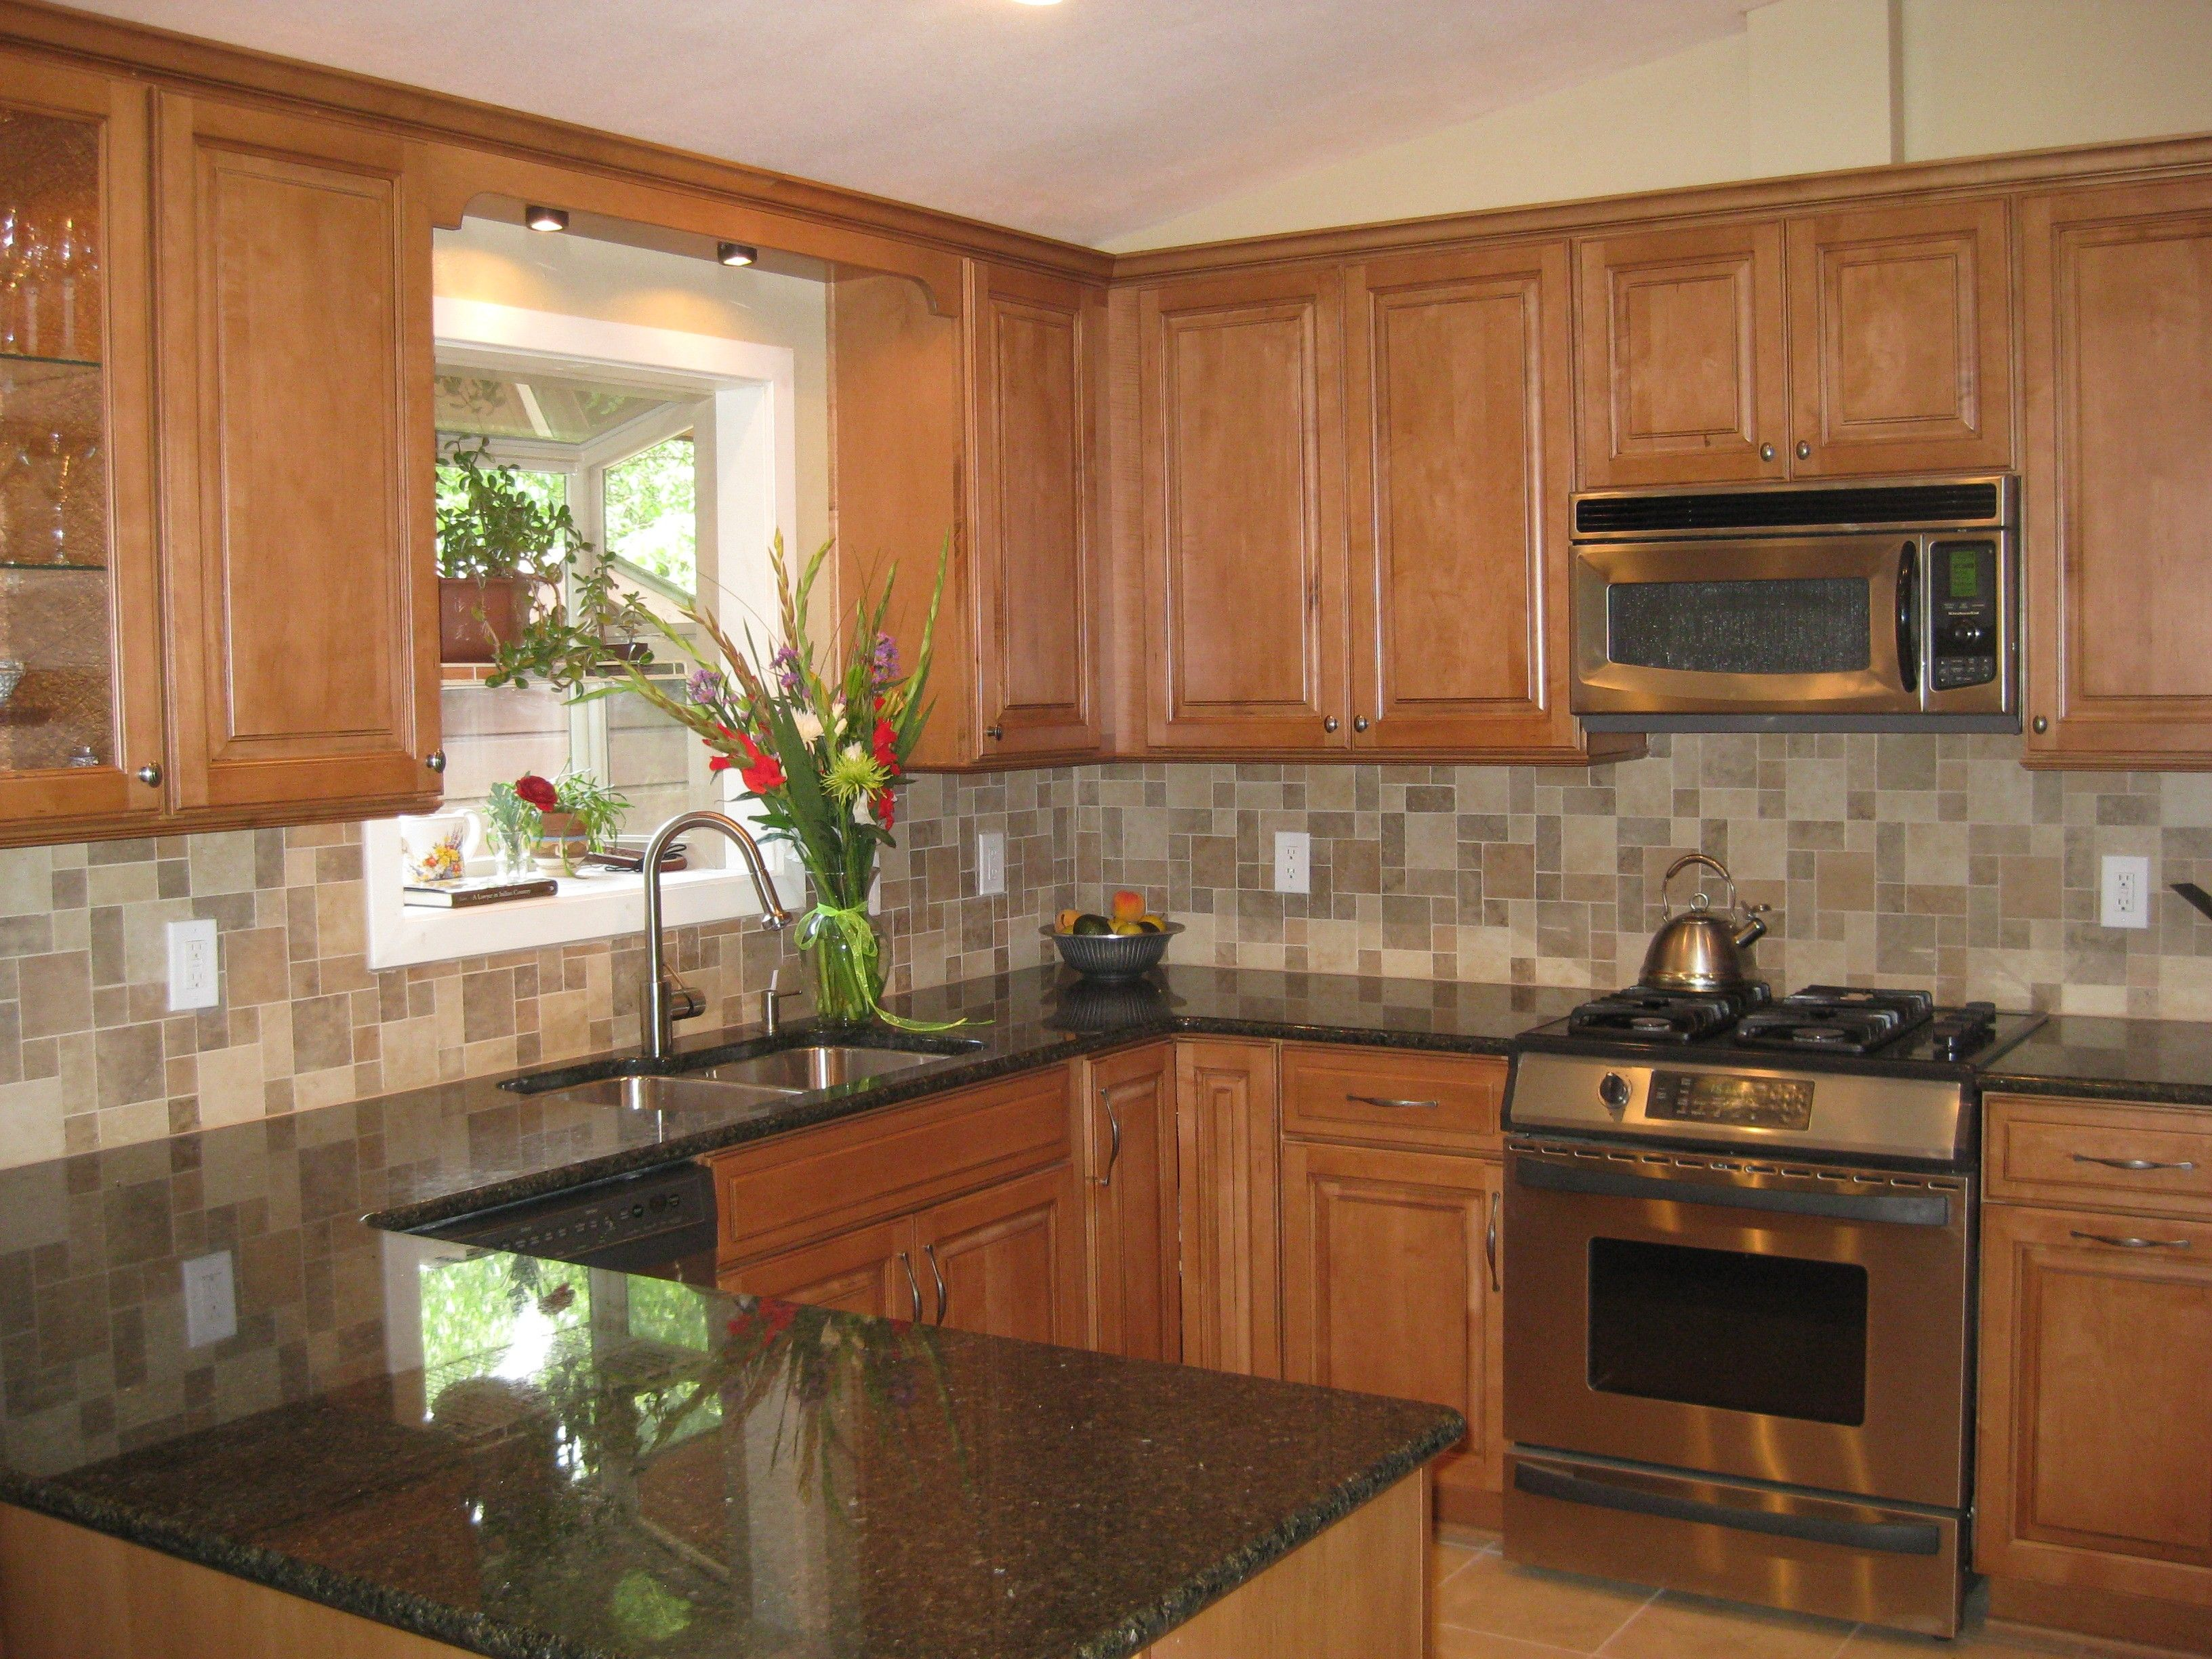 kitchen backsplash ideas maple kitchen sink white ... on Backsplash For Maple Cabinets And Black Granite  id=38901